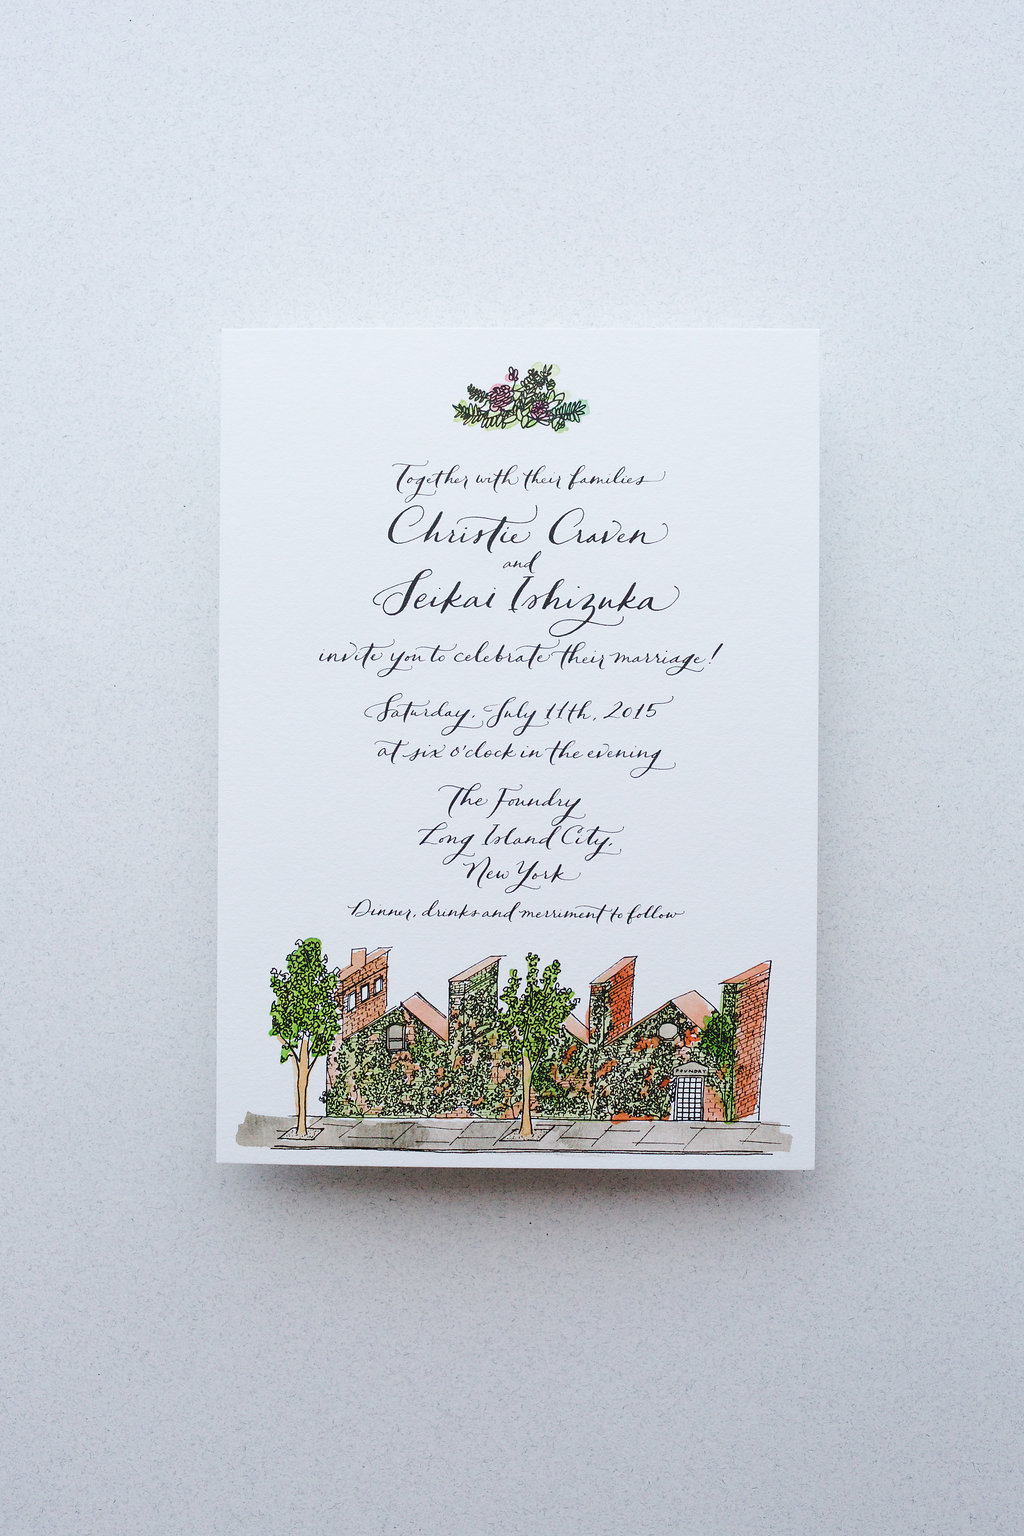 paperfinger-foundrywatercolor.jpg